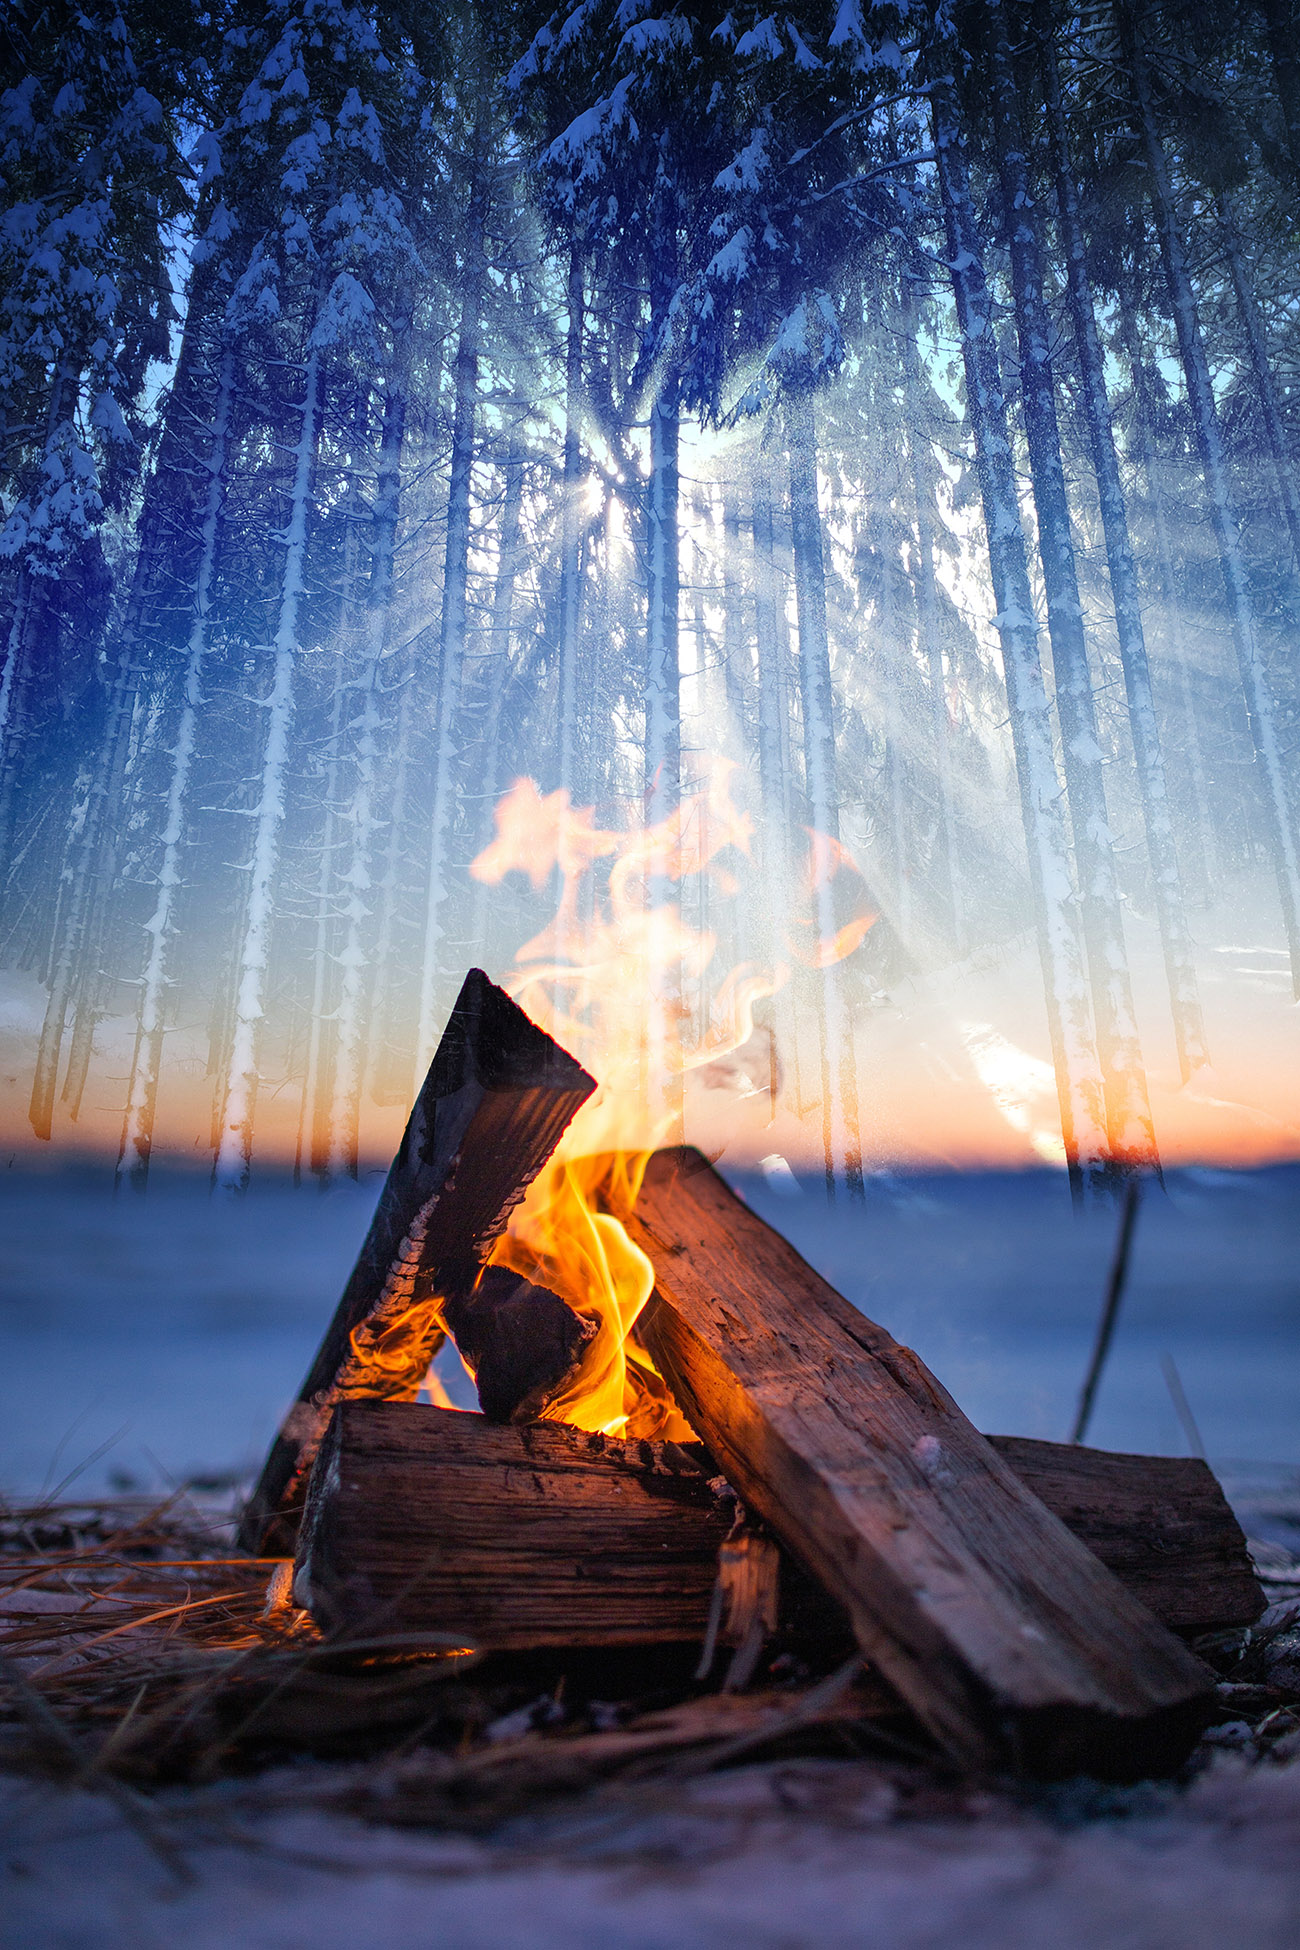 Wintery Wood Fire 01 - RF Stock Image